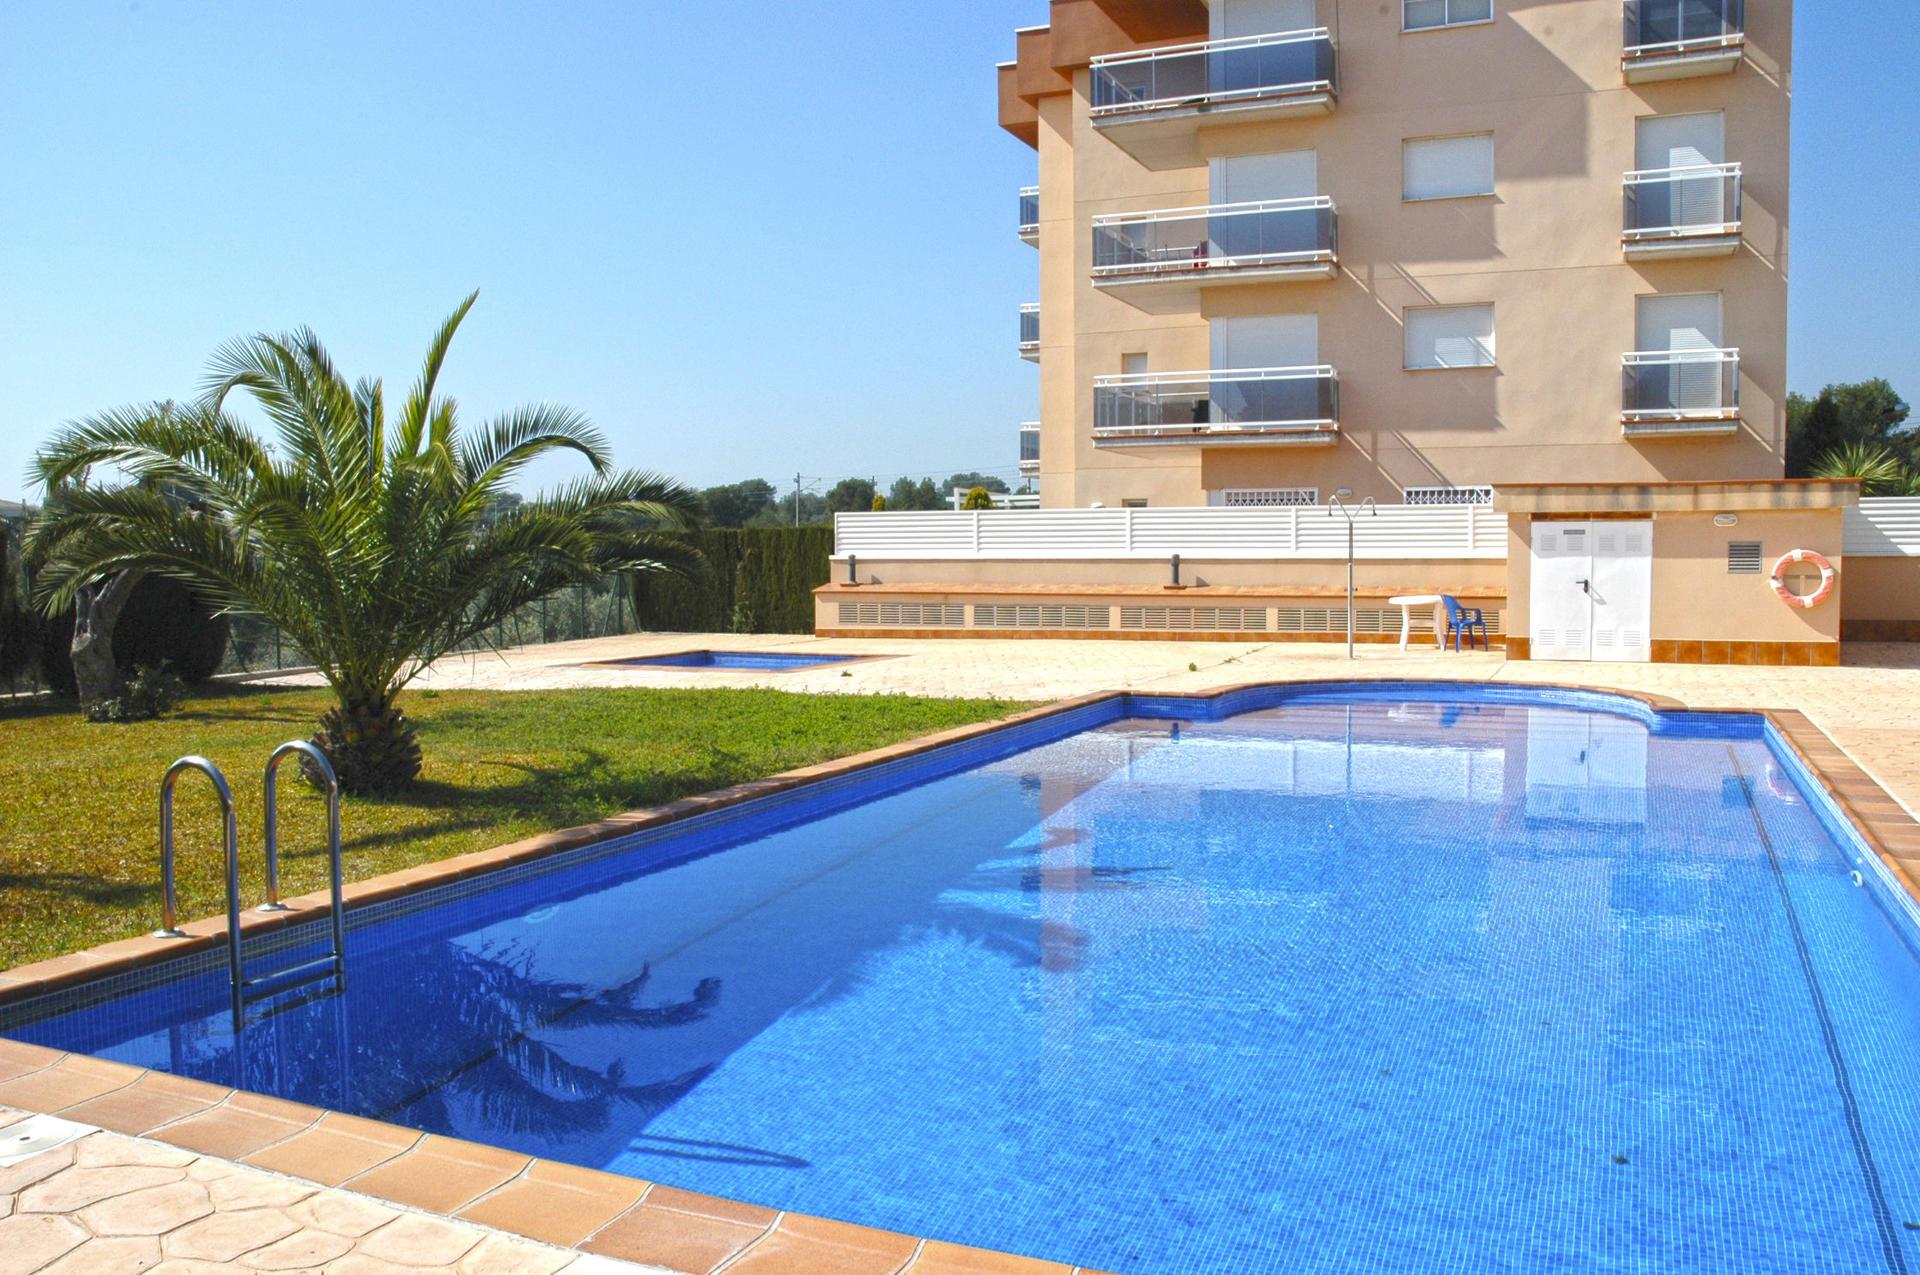 Apartamento -                                       El Perelló -                                       2 dormitorios -                                       6 ocupantes